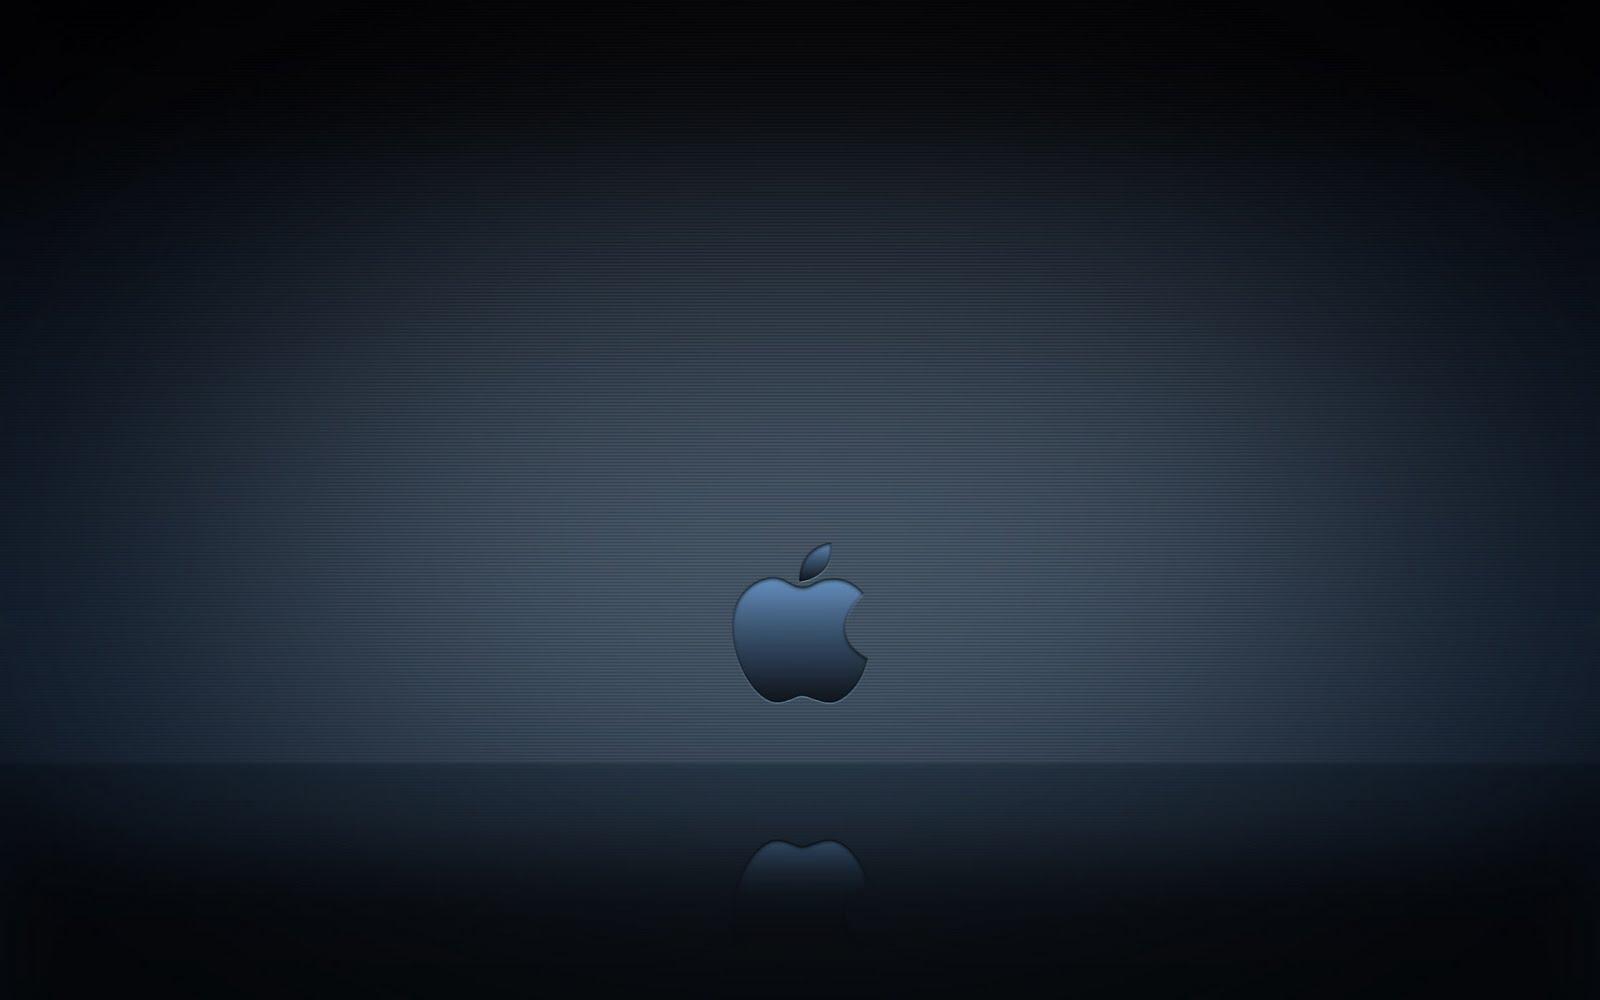 desktop wallpapers Apple Mac Wallpapers HD Apple iPhone 1600x1000